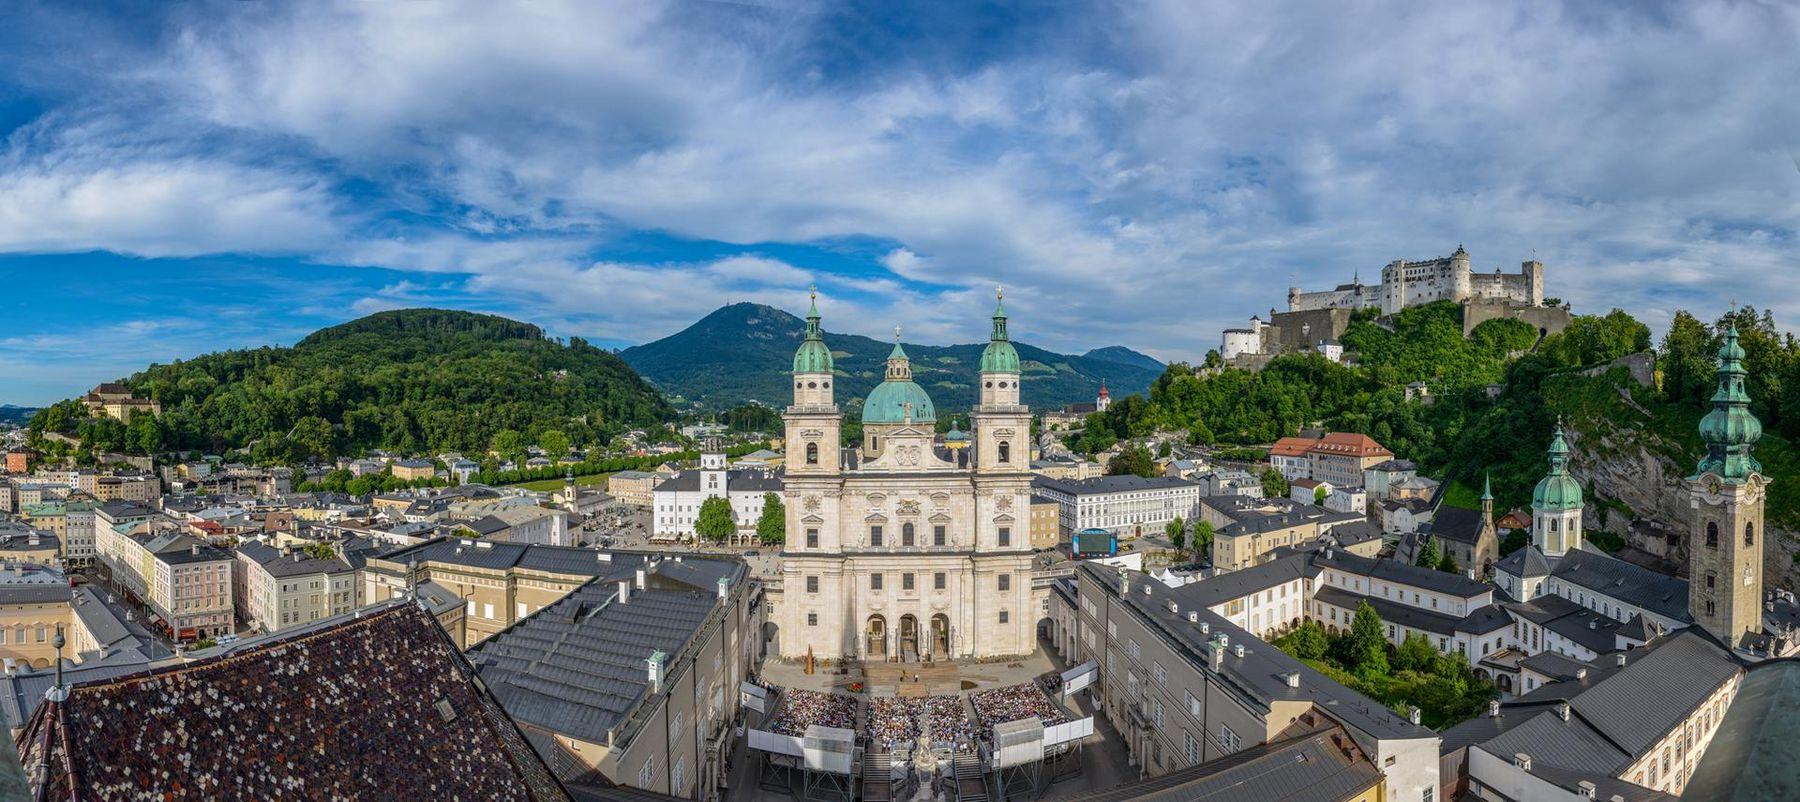 Tourismus Salzburg Foto Breitegger Gunter Festpsiele Domplatz